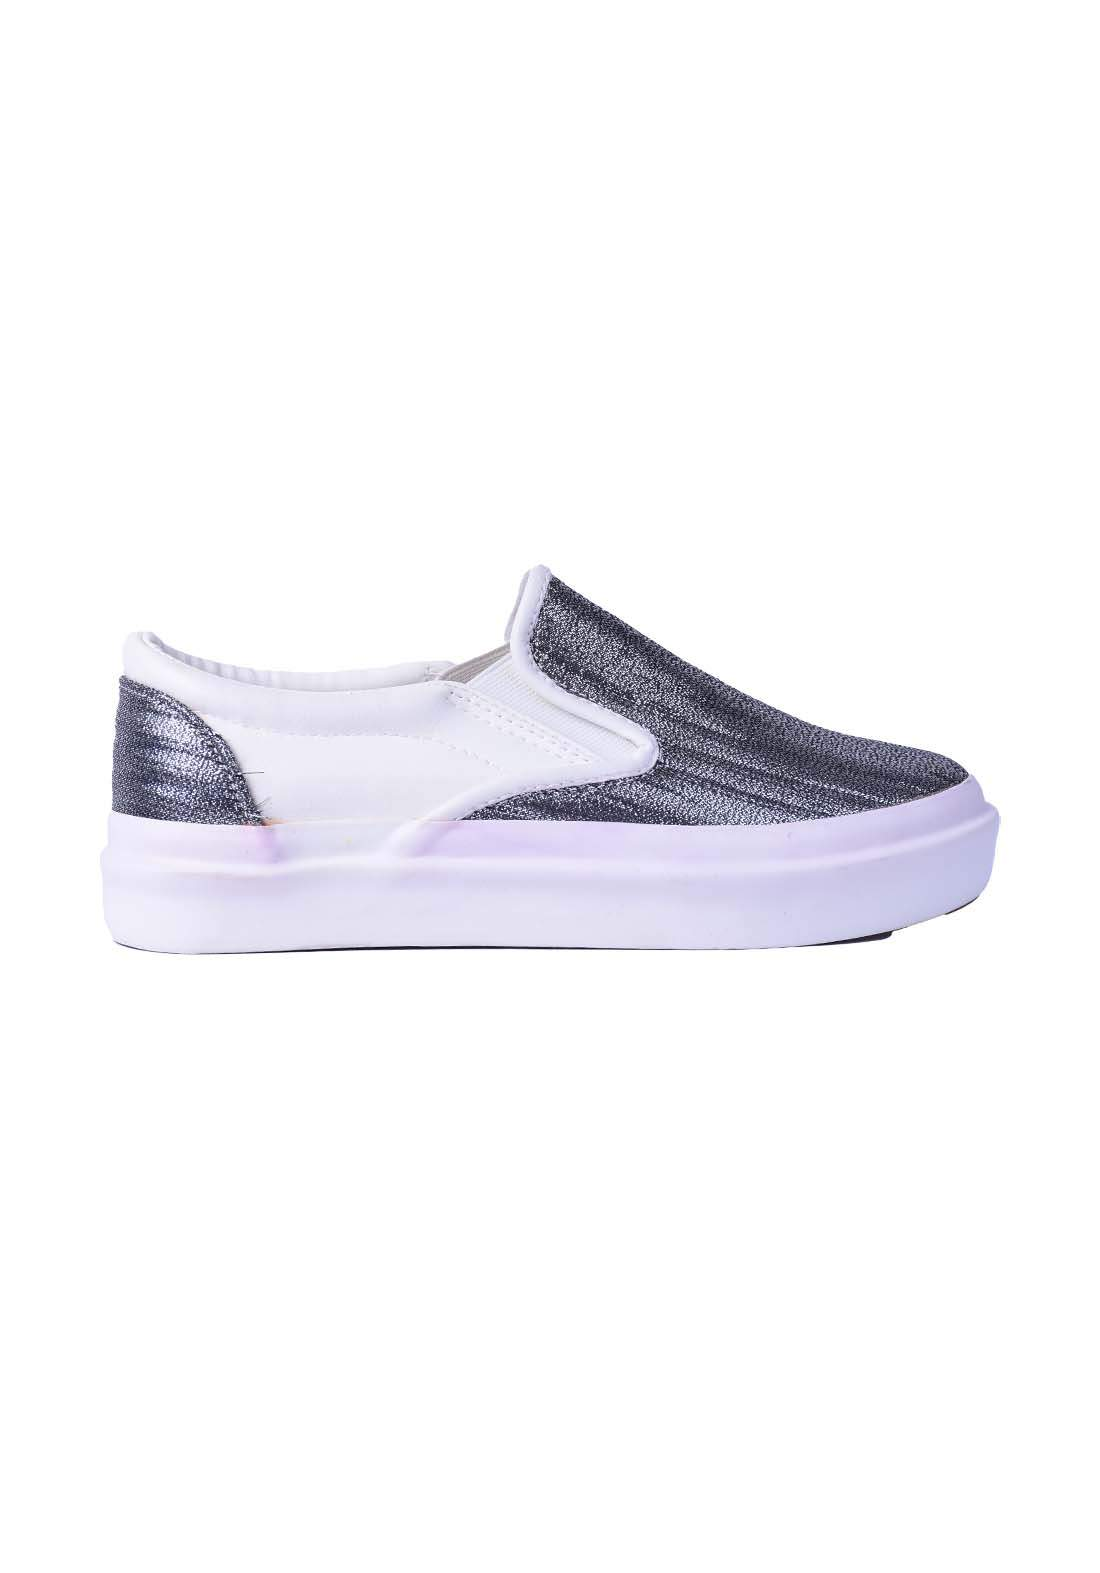 حذاء نسائي قماش متعدد الالوان